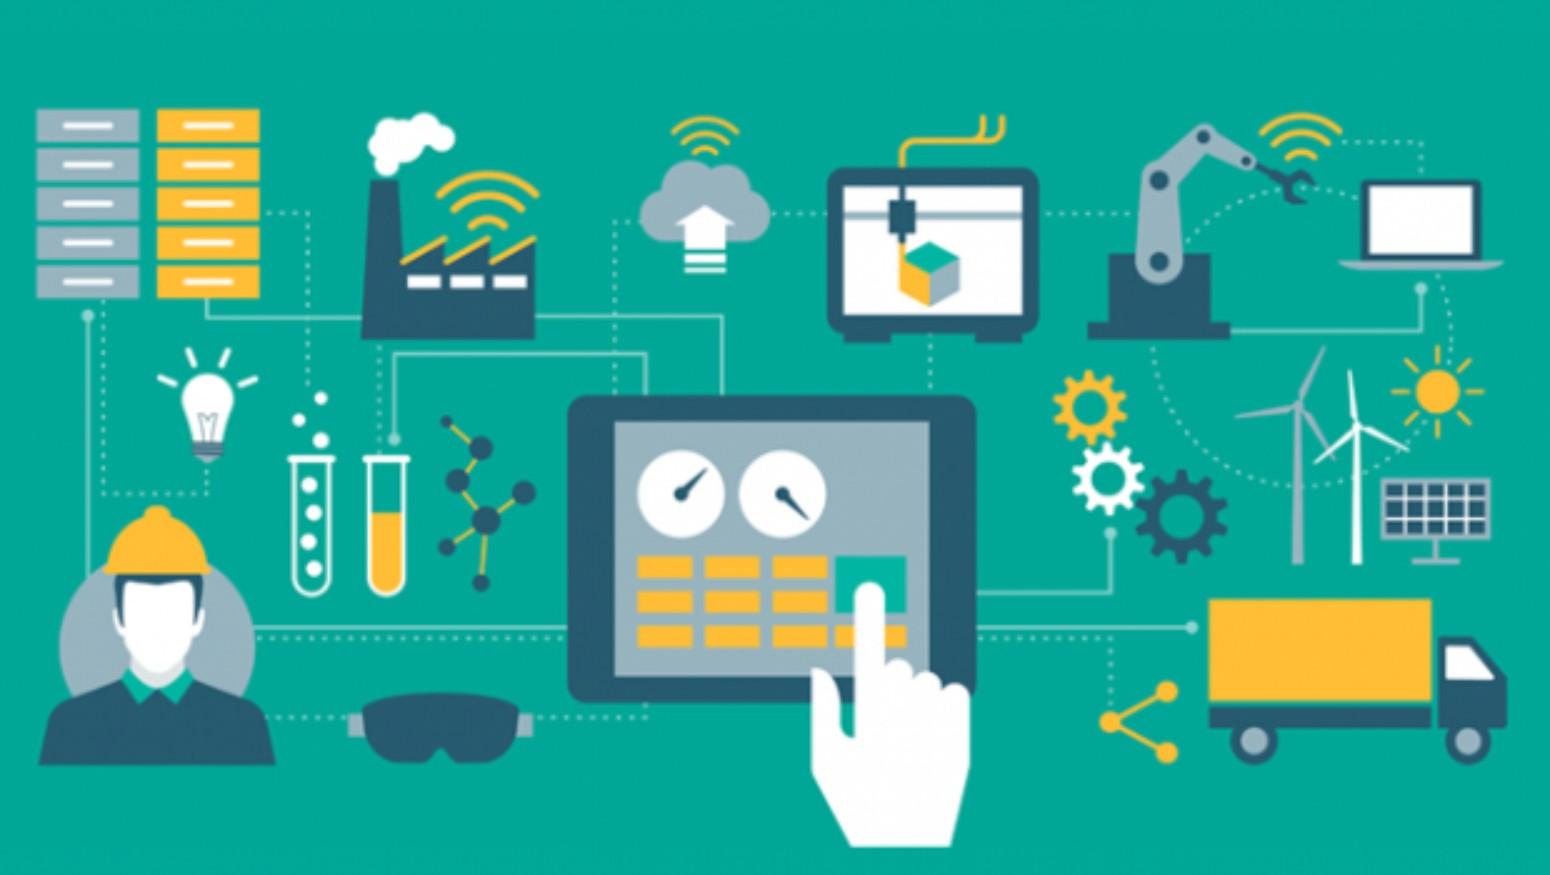 Top 5 Edge Computing Use Cases